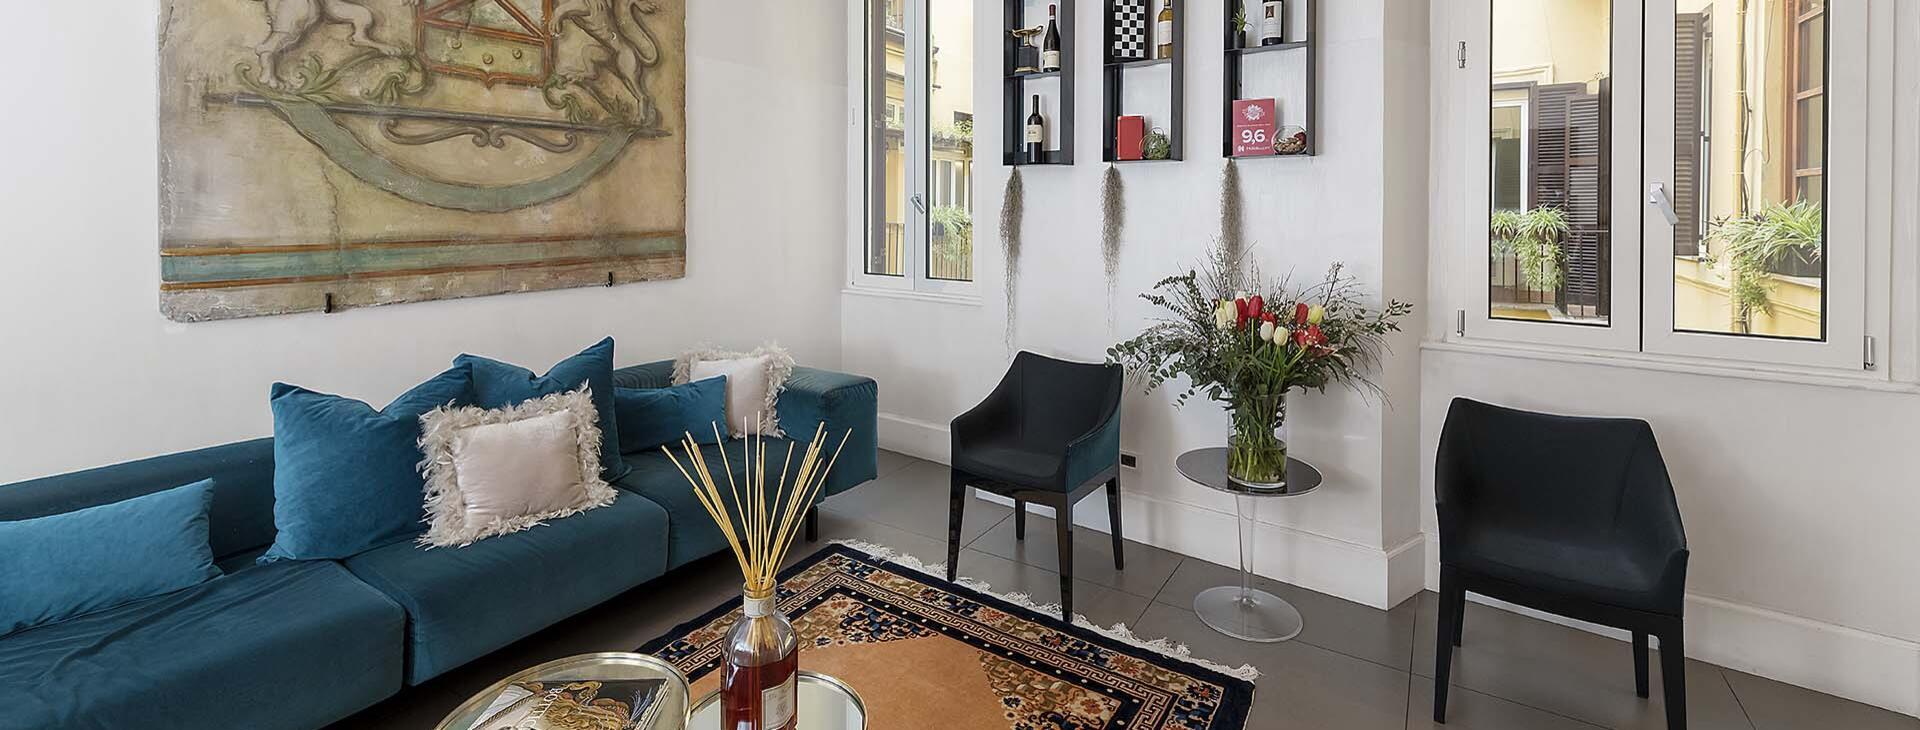 argentinastylehotel fr argentina-style-hotel-pantheon-galerie-de-photos 001